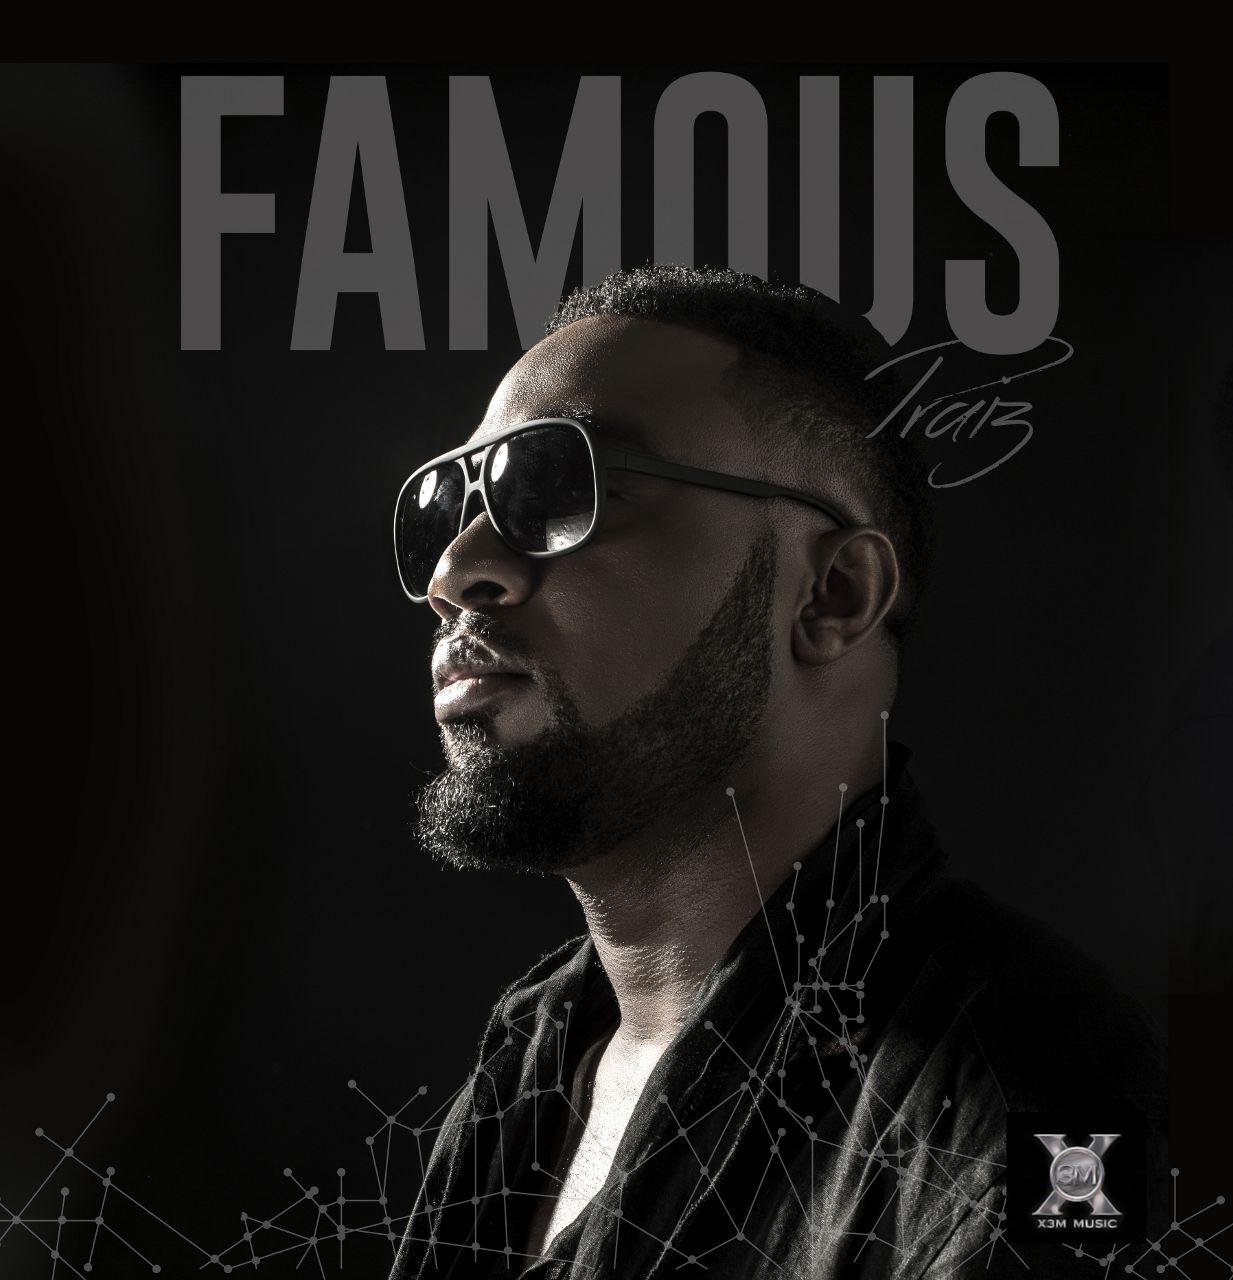 Praiz - Famous (Album Art)-Front